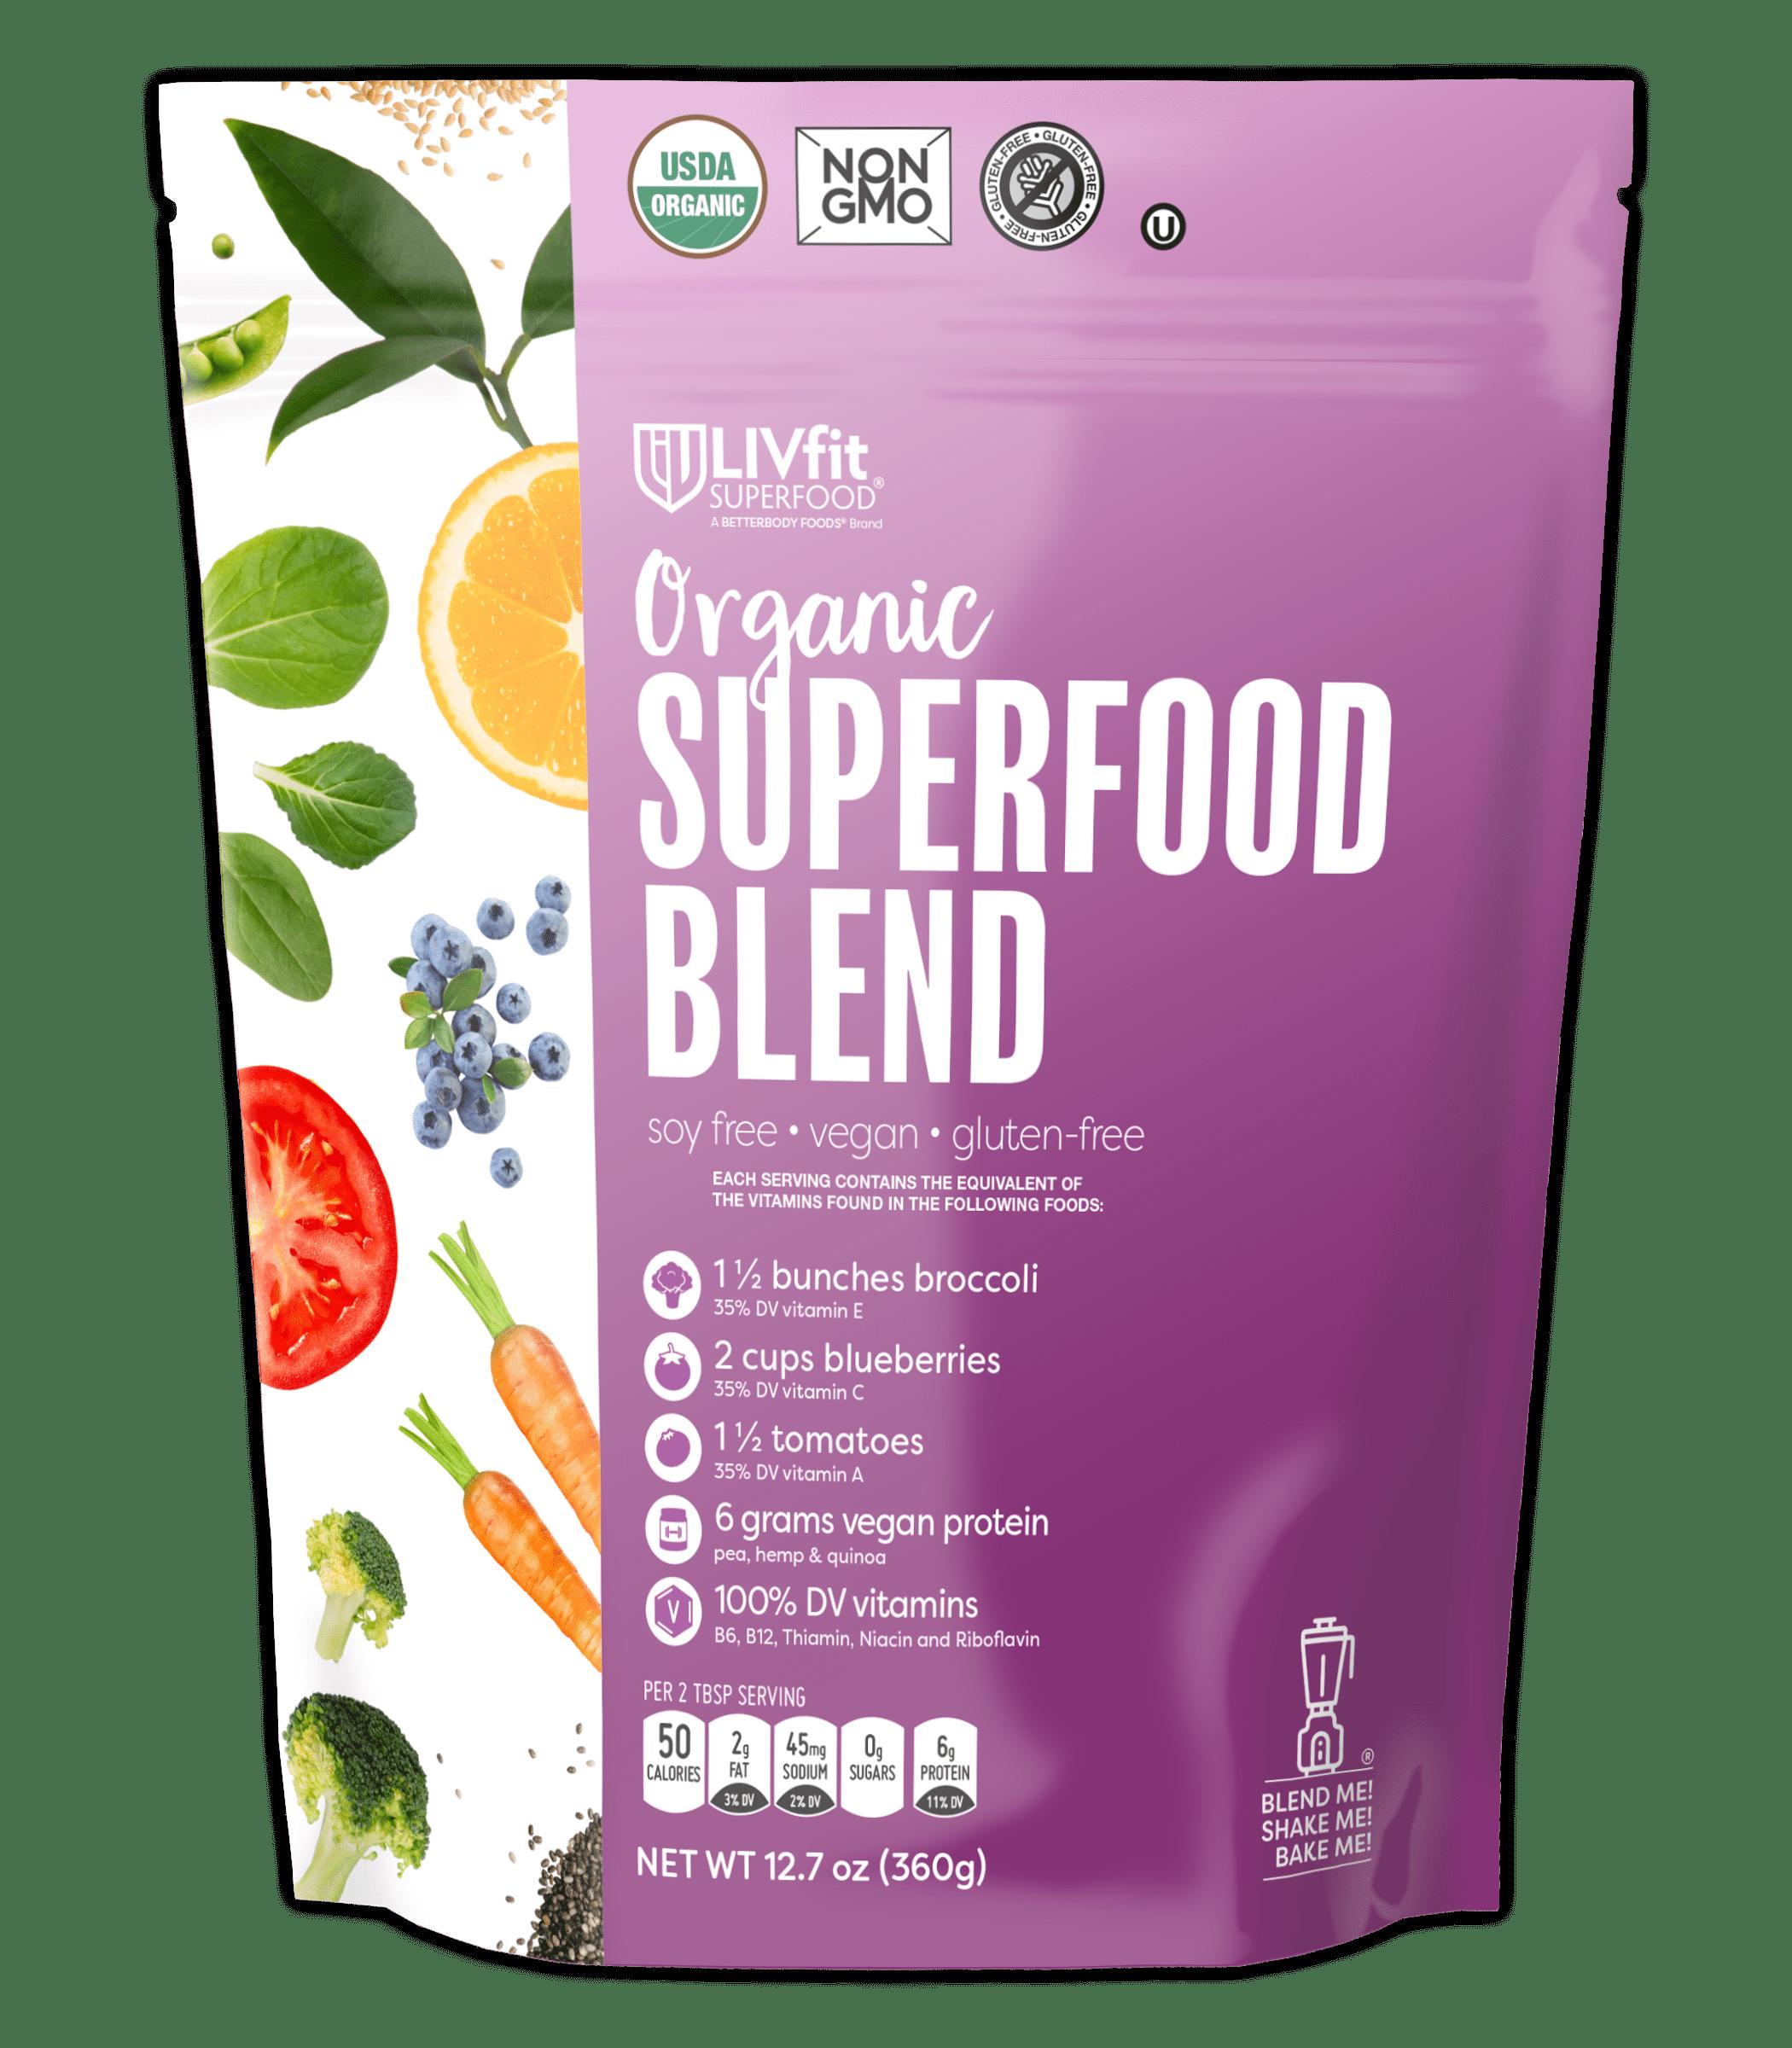 BetterBody Foods Organic LIVFit Superfood Blend Powder, 12.7 Oz